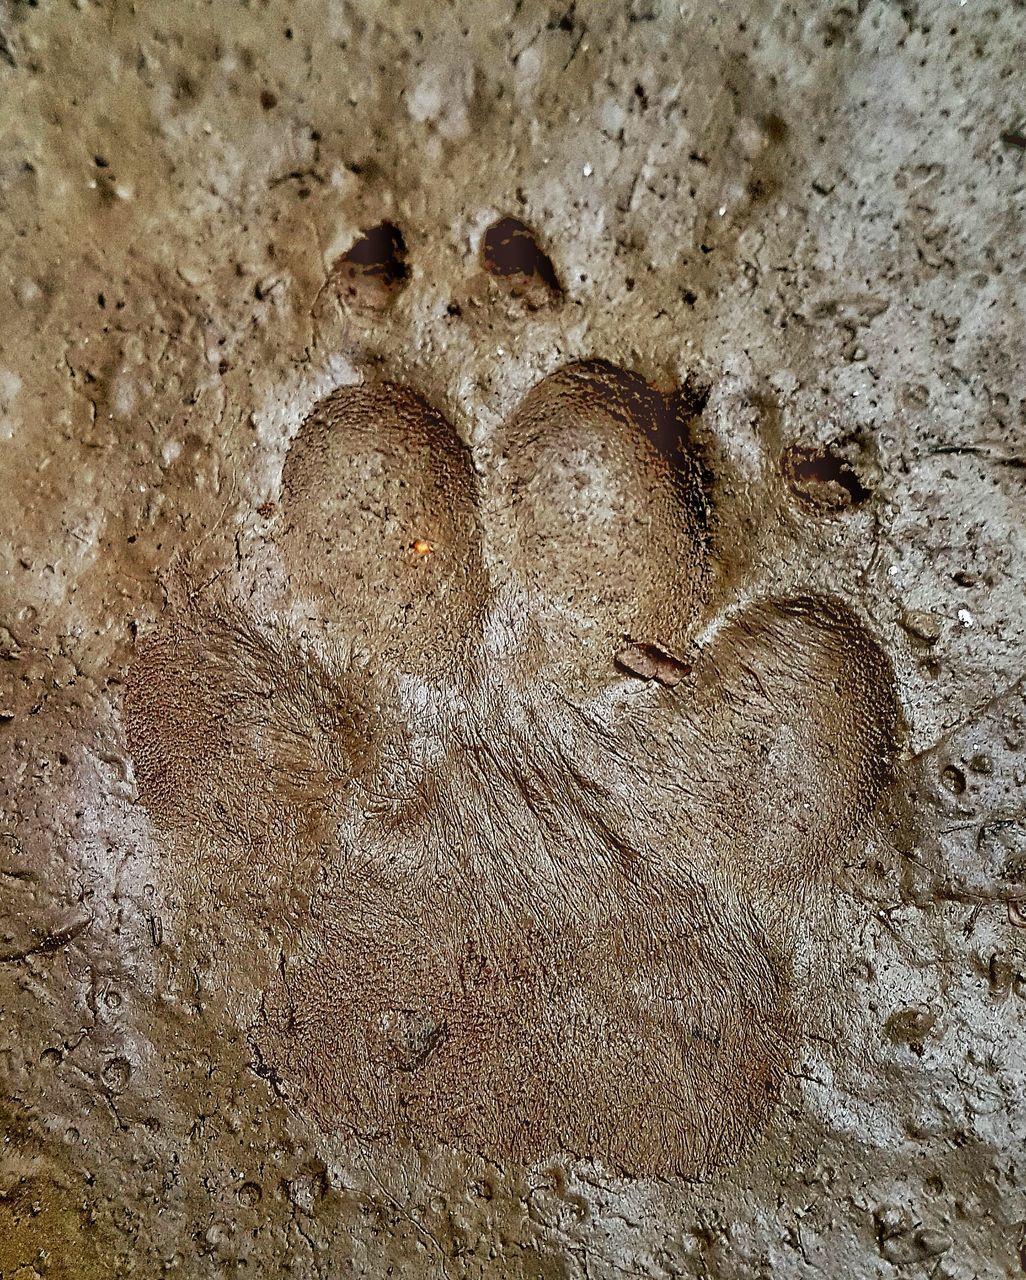 footprint, sand, paw print, no people, day, nature, outdoors, track - imprint, beach, close-up, bird, animal themes